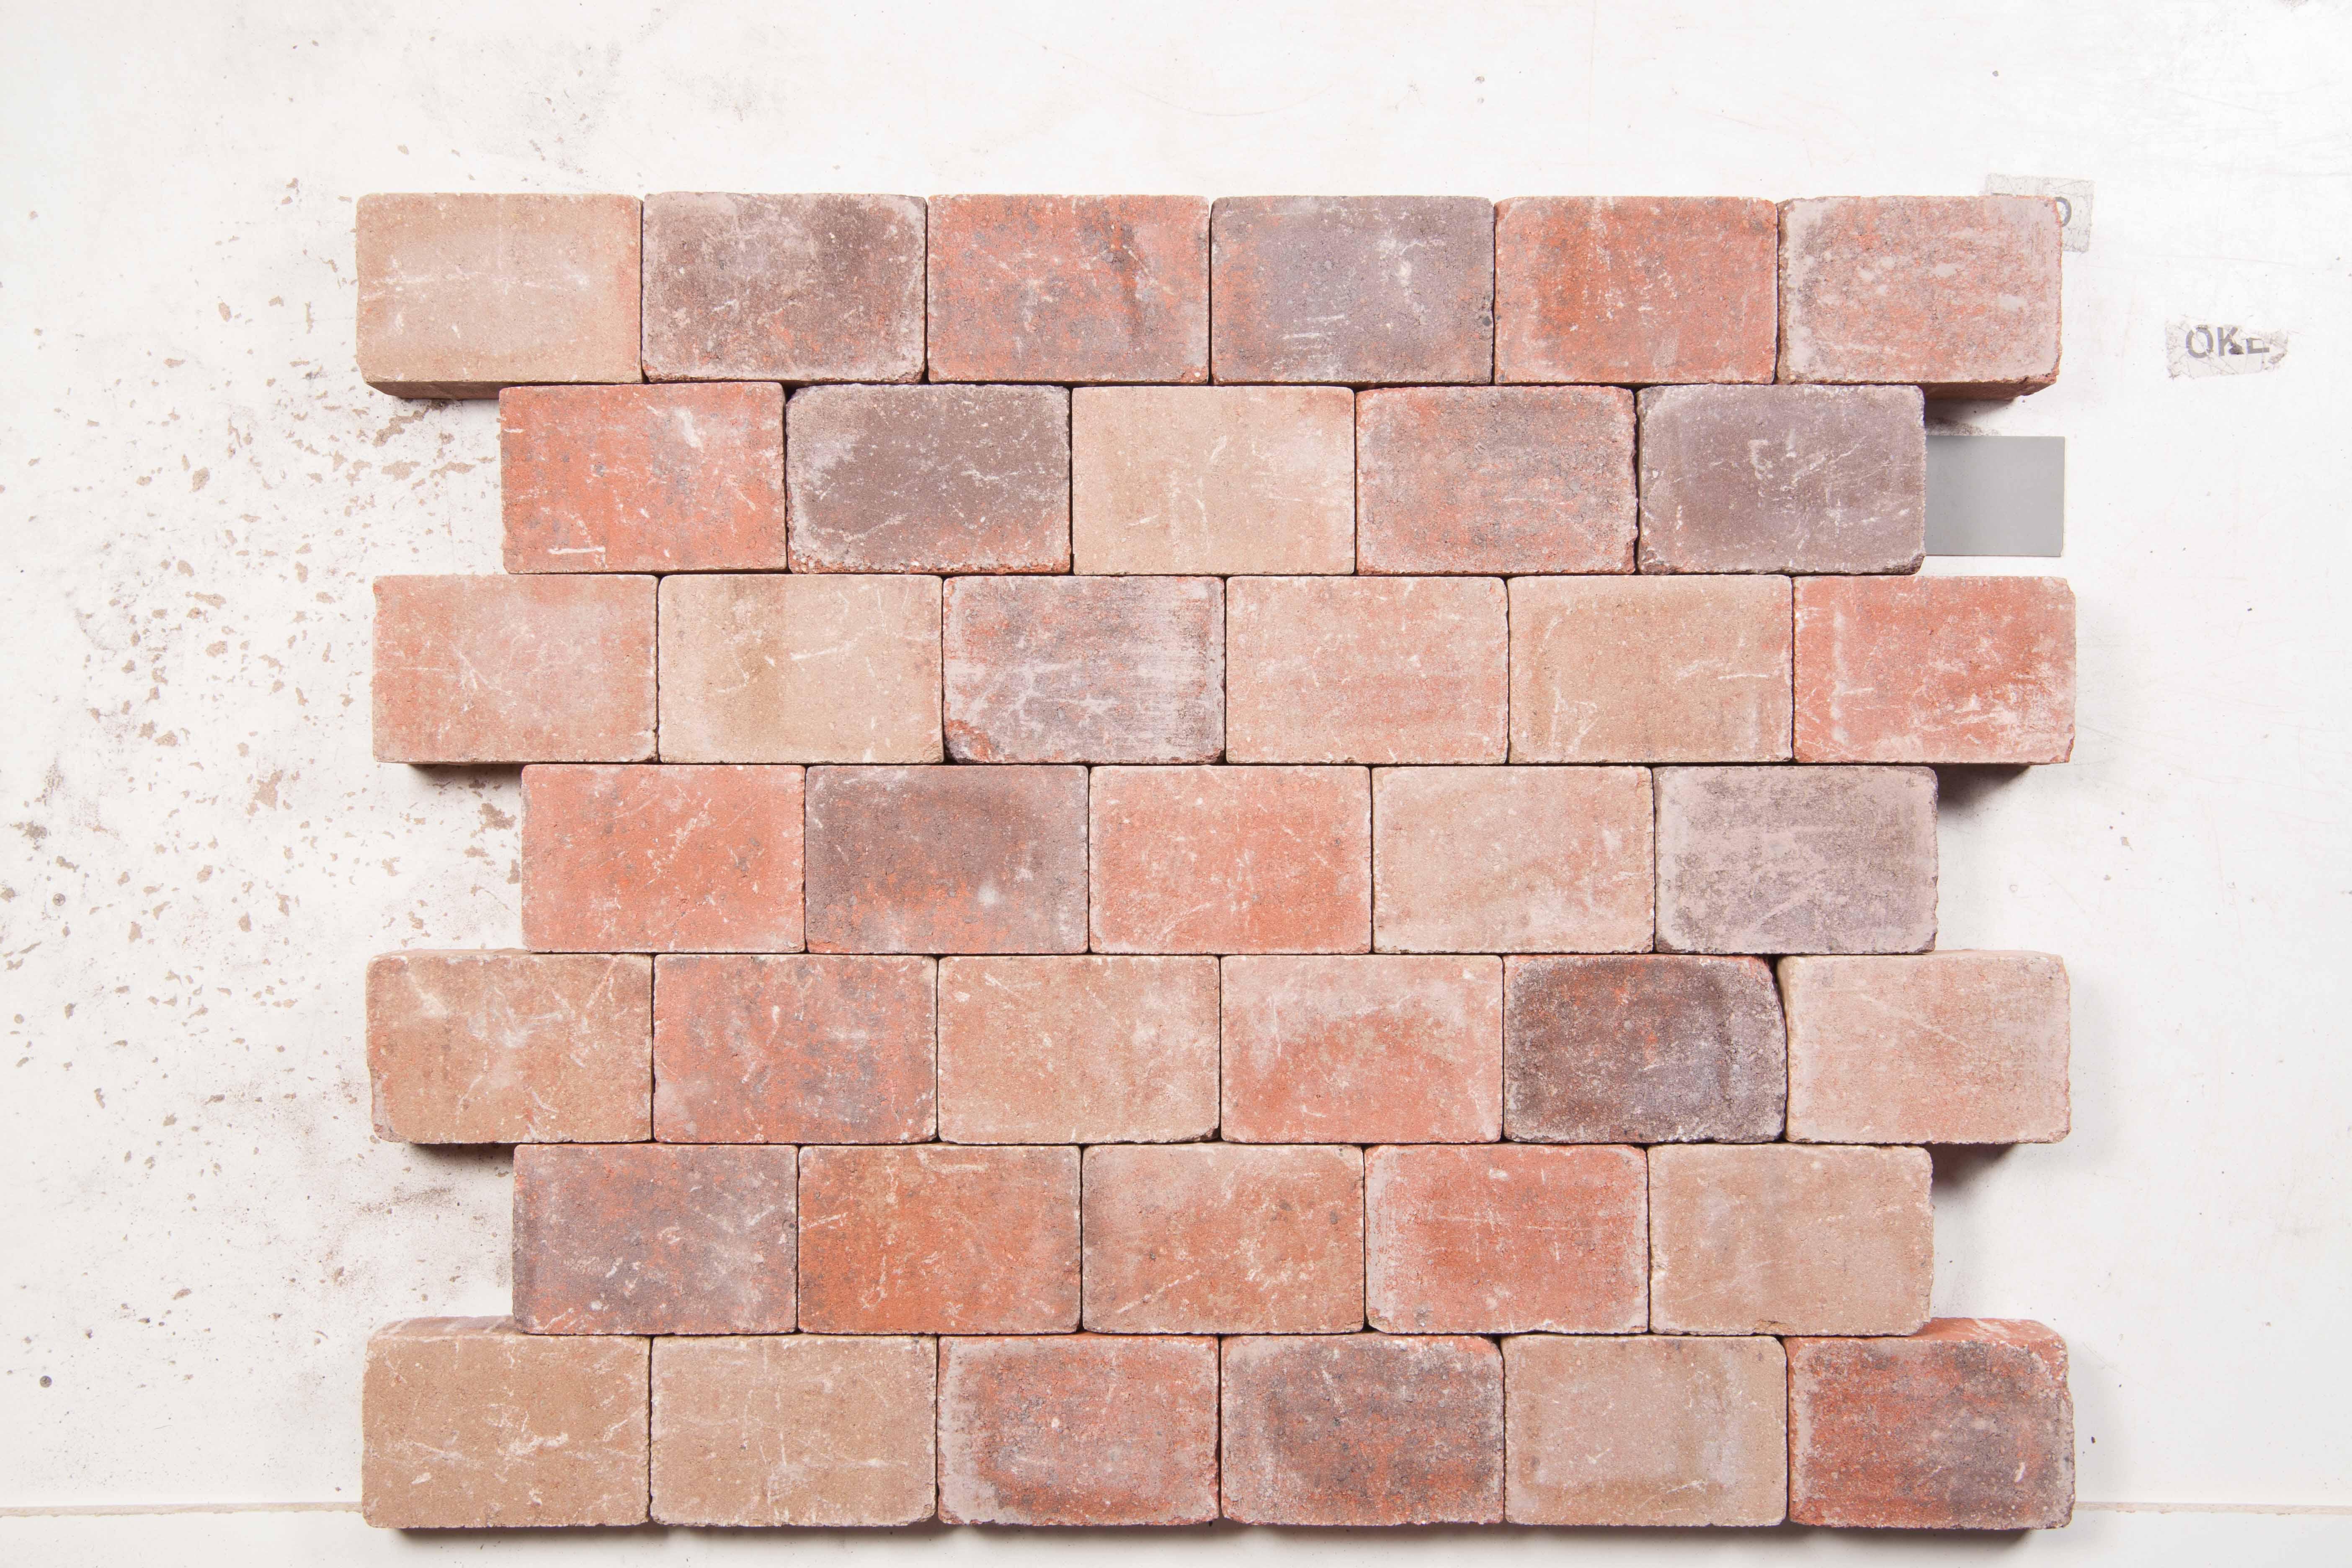 Redsun | Tumbelton 15x22.5x6 | Copper Blend